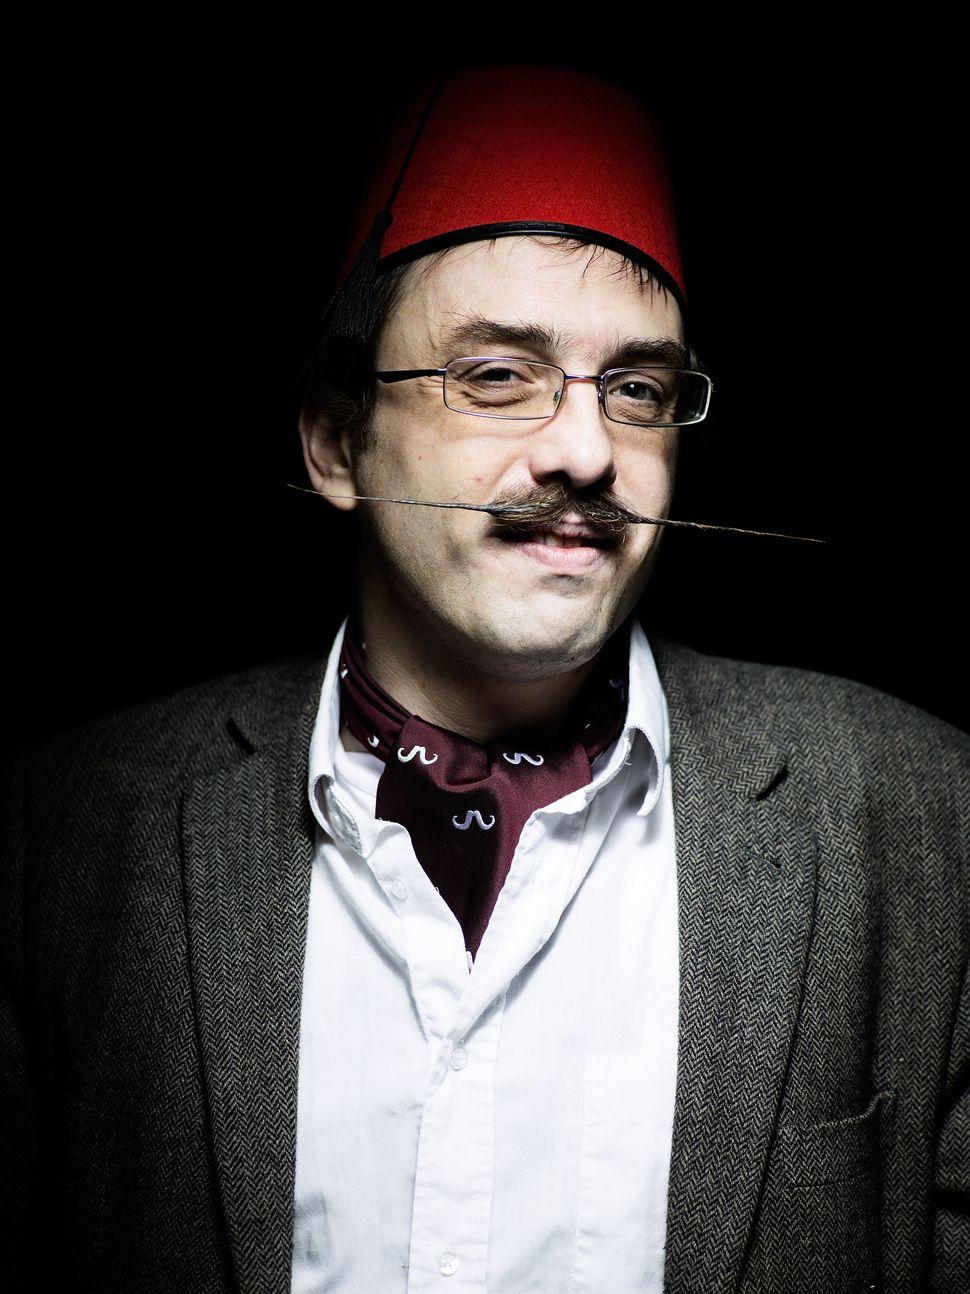 Handlebar Club member James Dyer, sporting an English moustache.